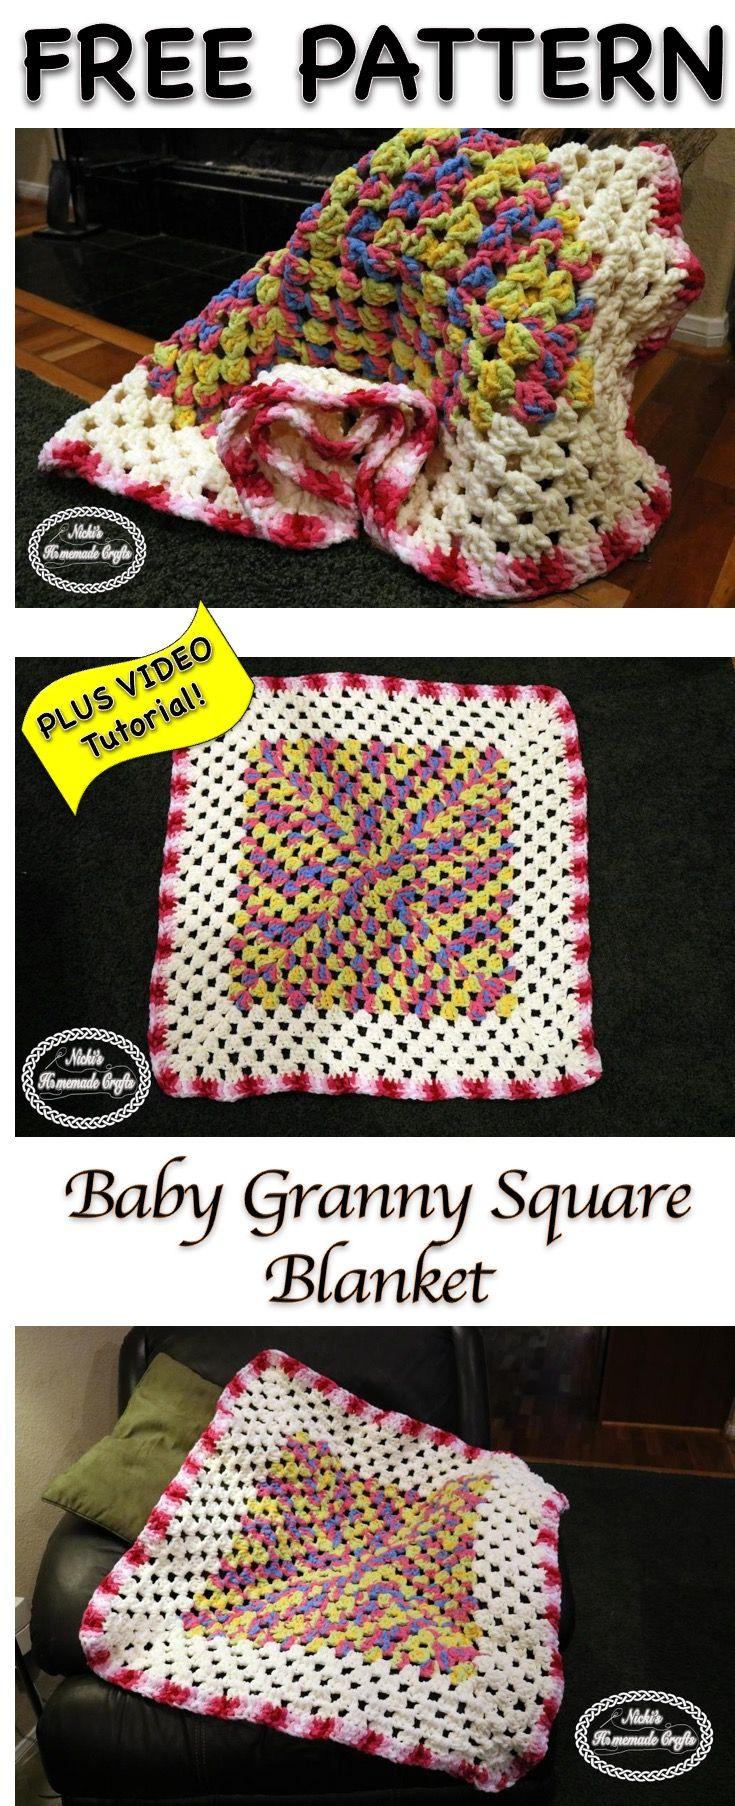 Baby Granny Square Blanket - Free Crochet Pattern   Manta, Puntadas ...